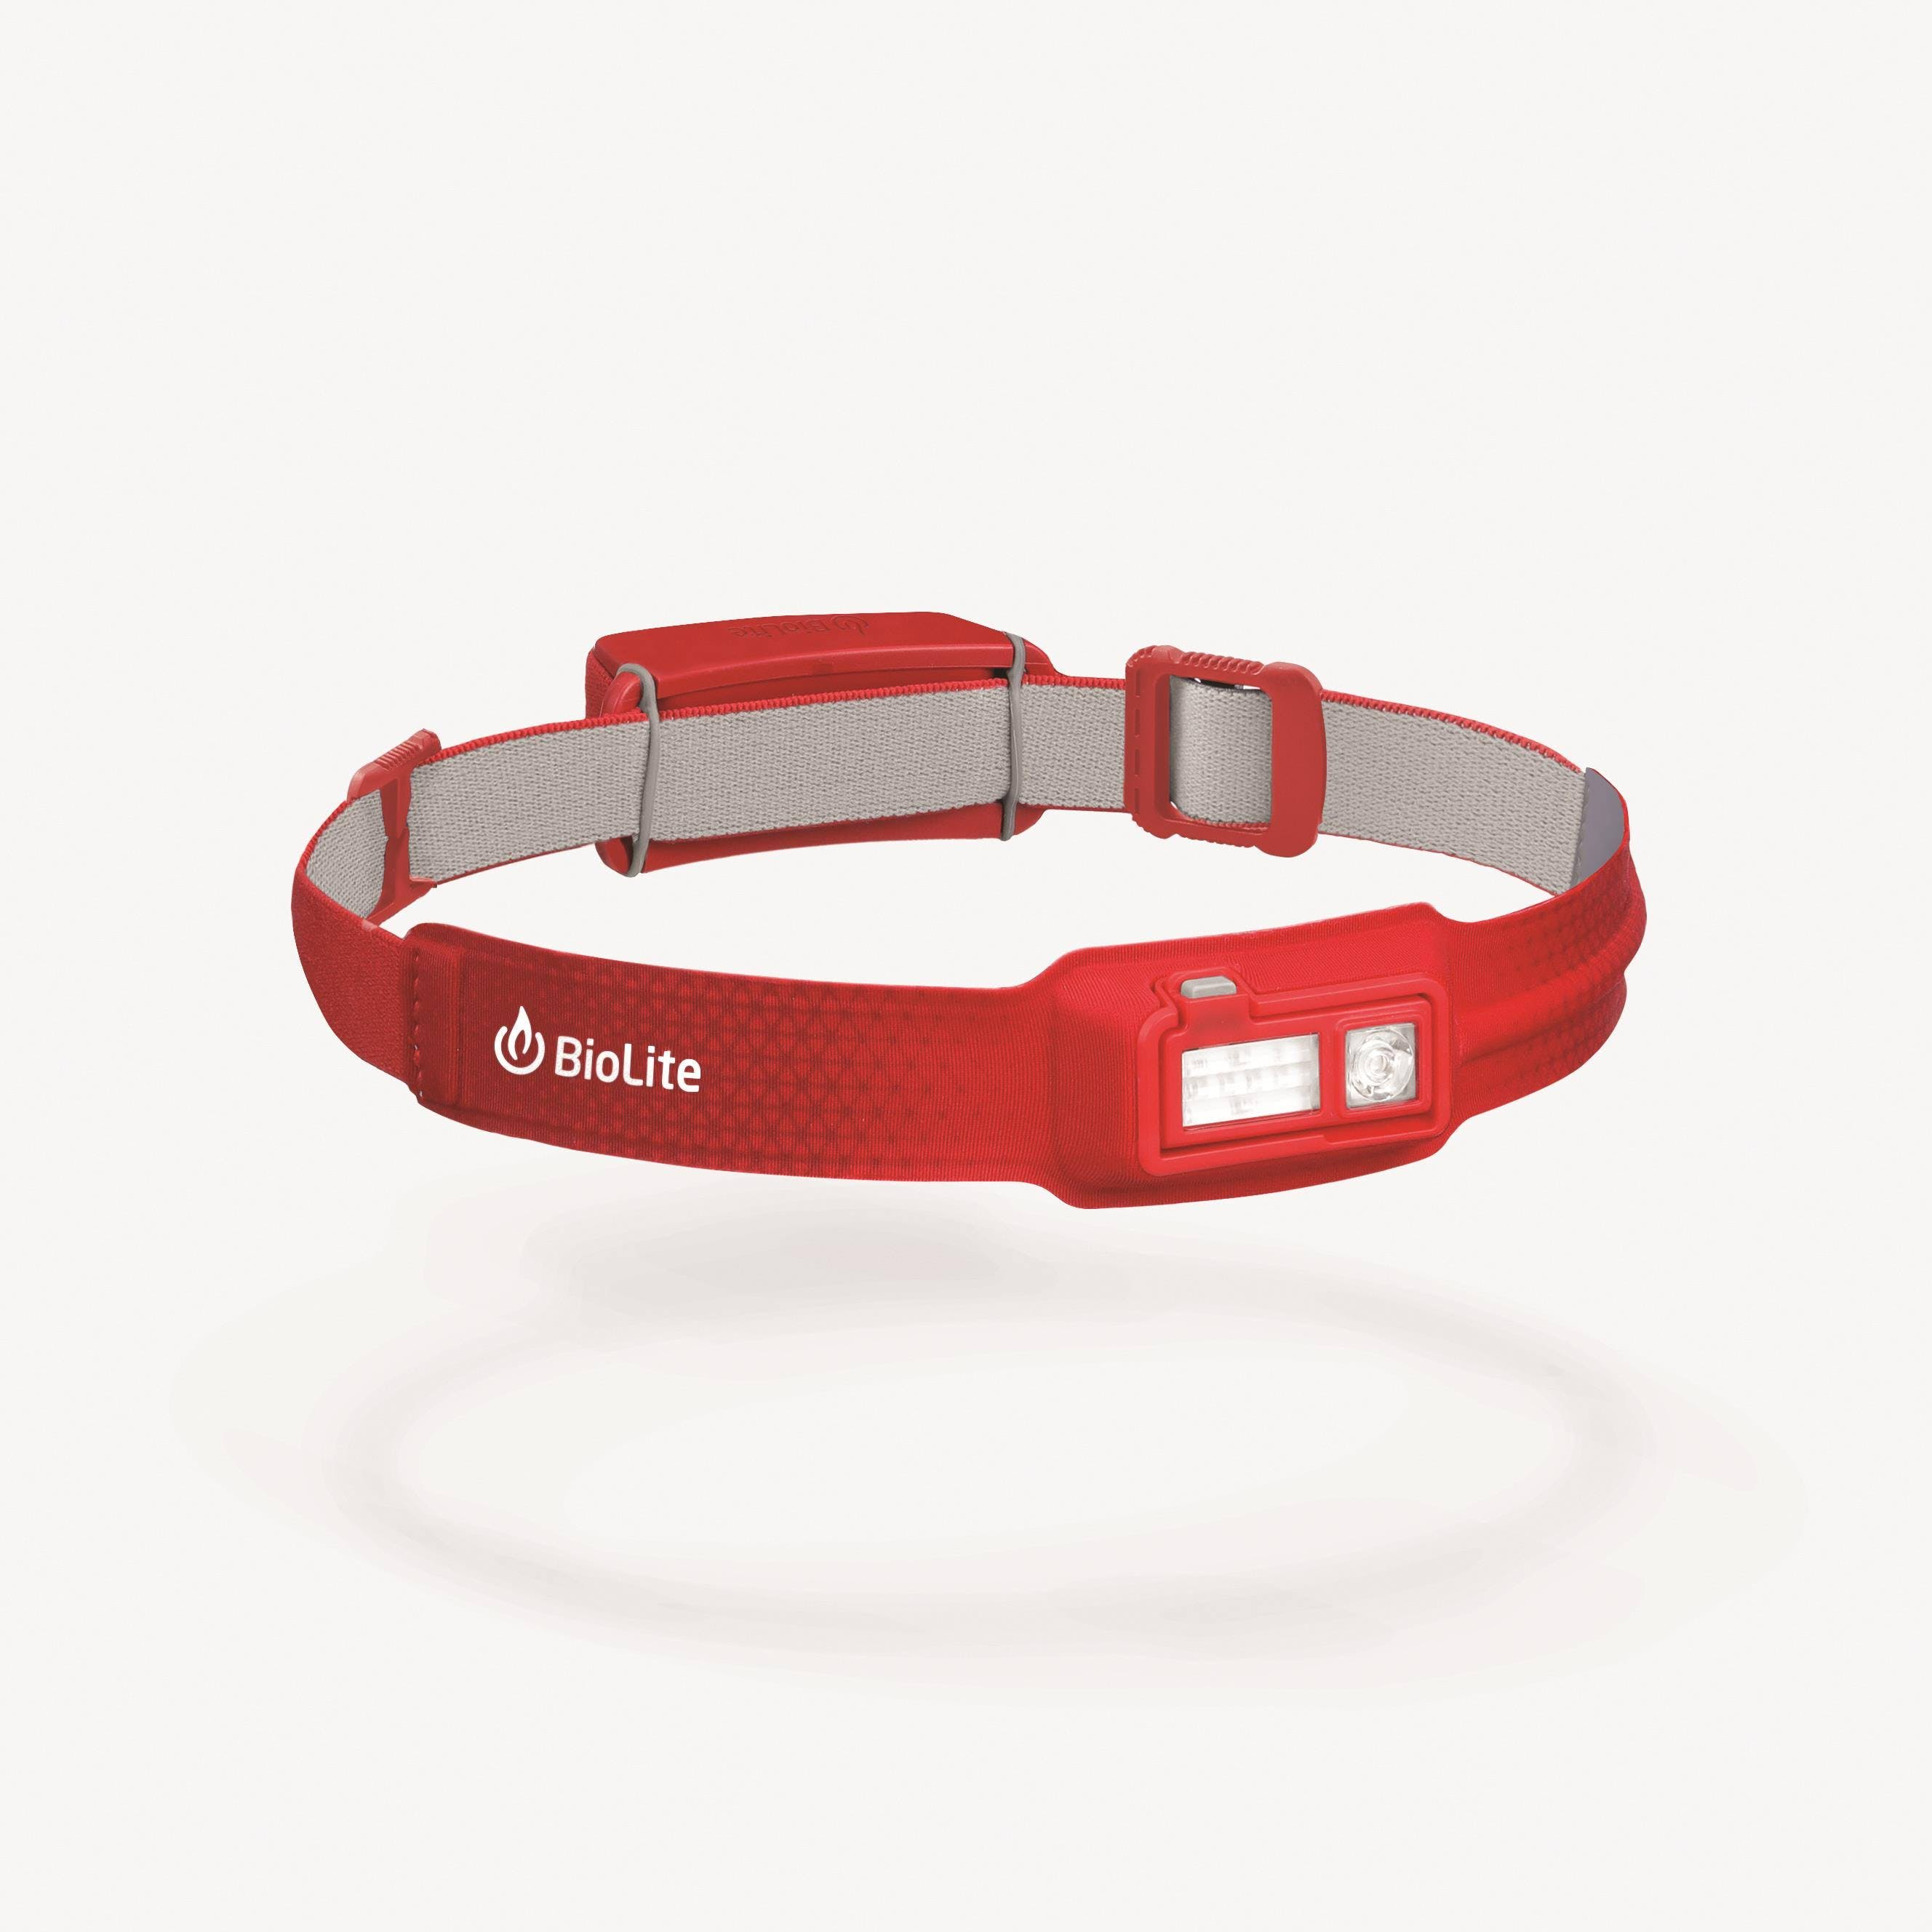 BioLite Headlamp 330 - Red